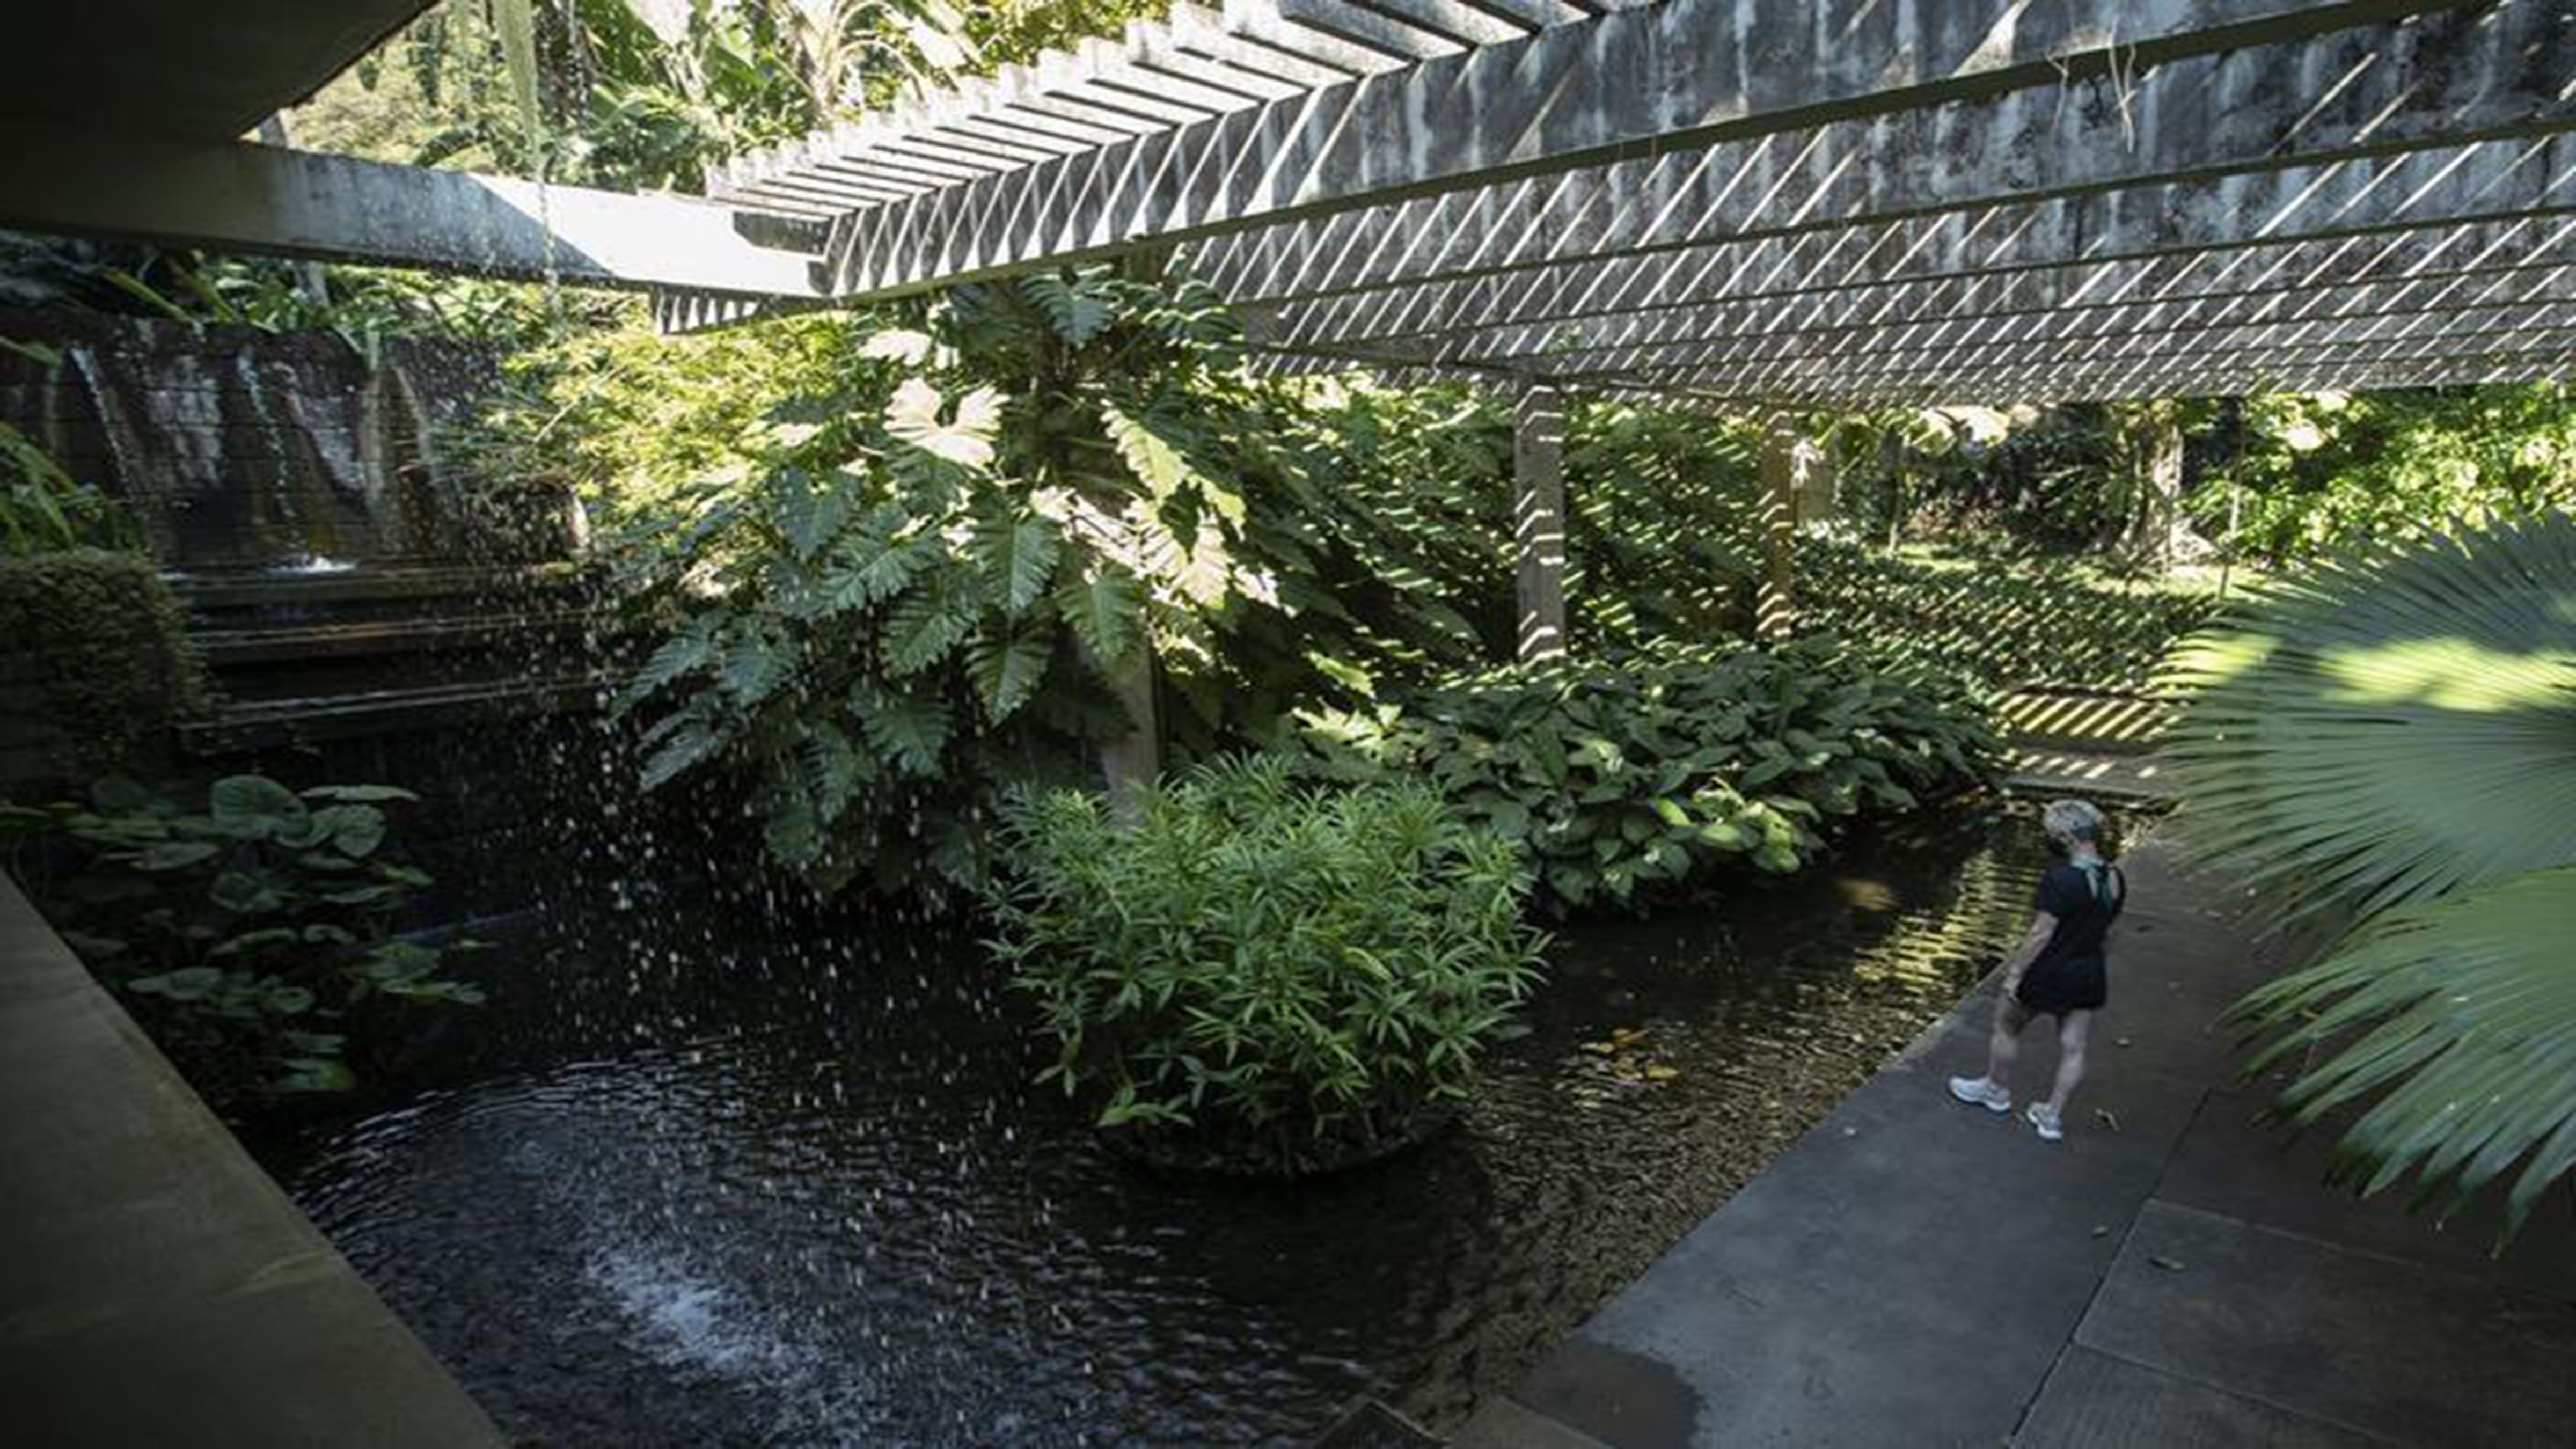 Brazil landscape garden earns UNESCO world heritage status photo from Yahoo